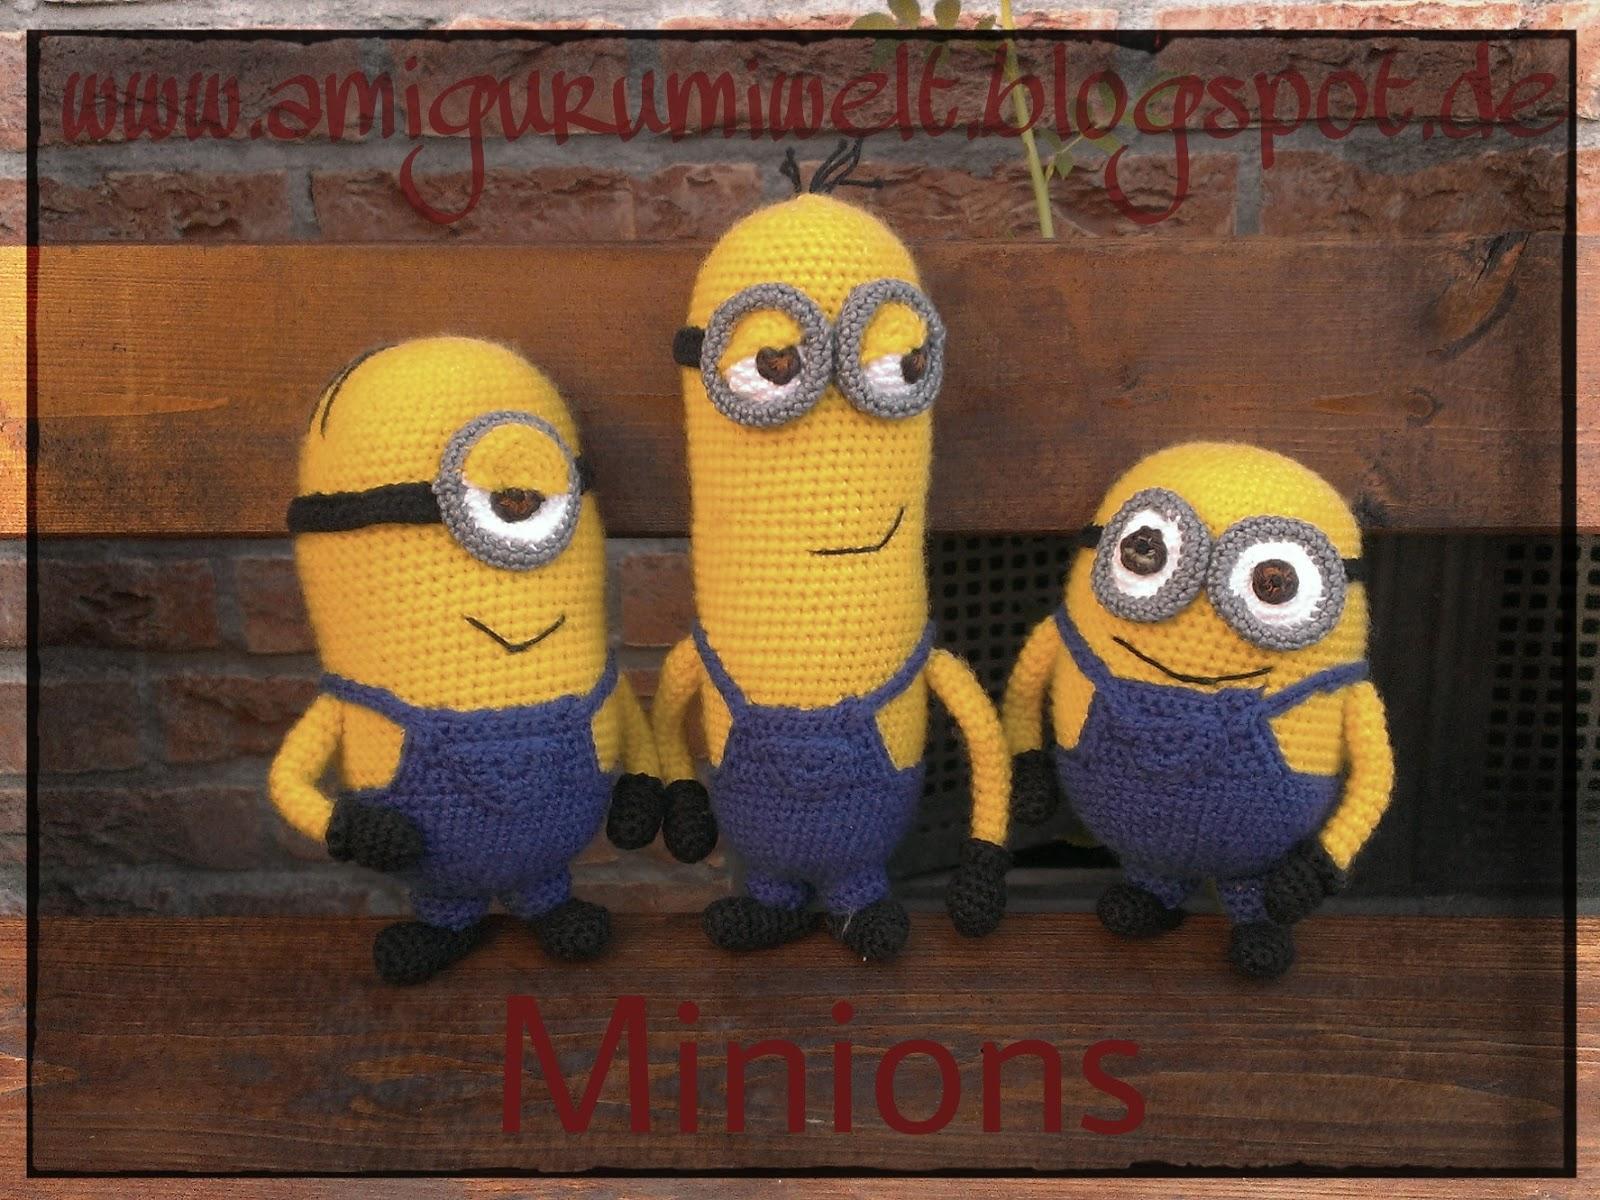 Wundervolle Amigurumi Welt: Die Minions kommen!